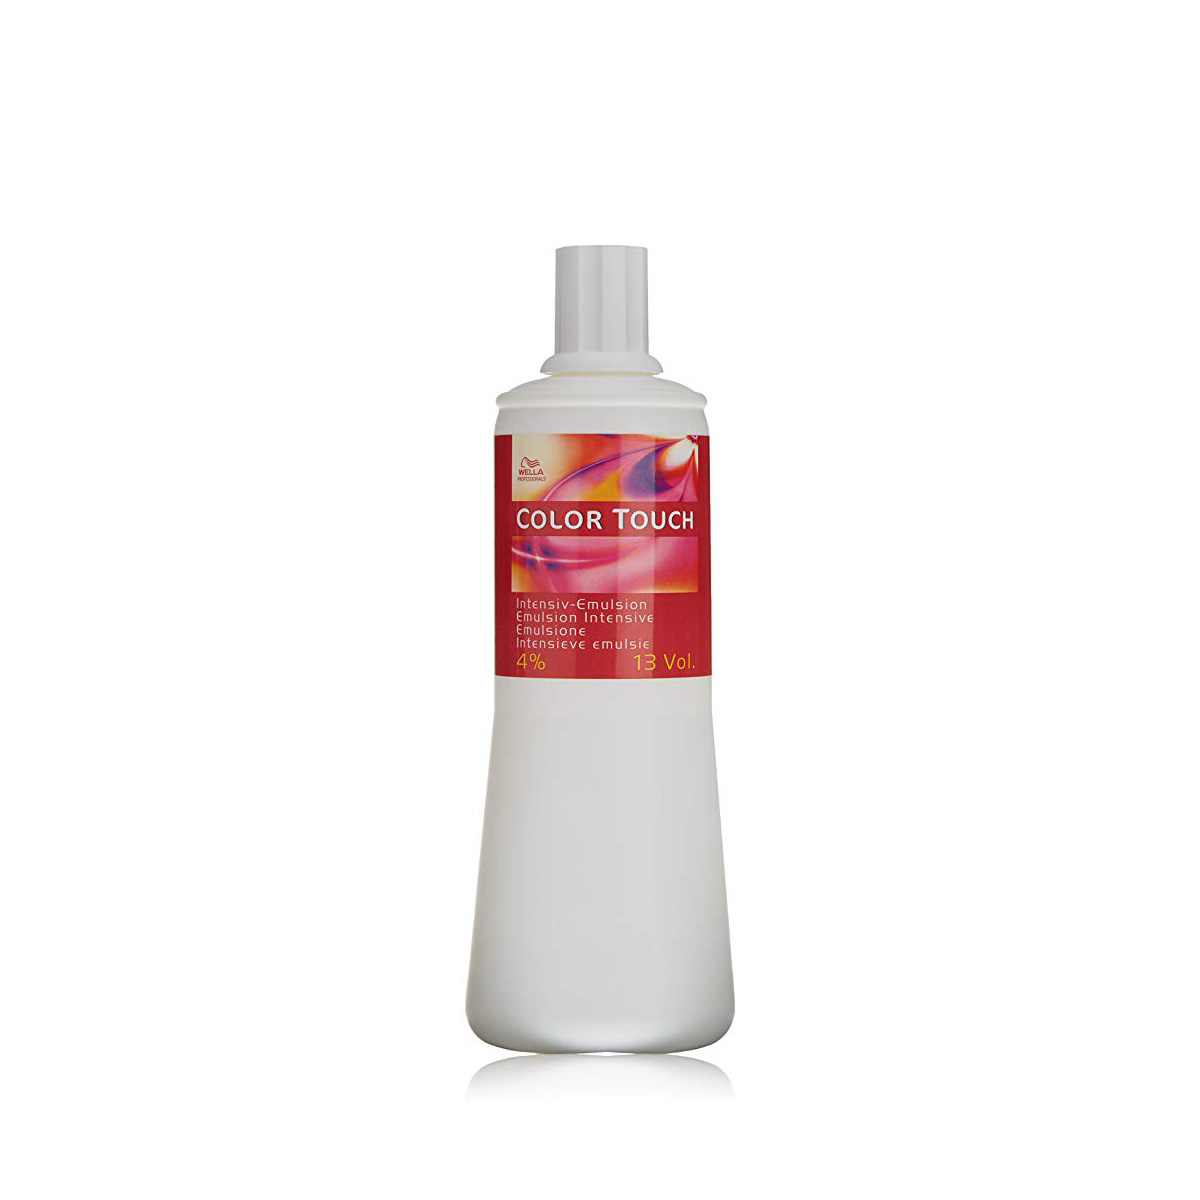 Emulsione 13 Vol 1000 Ml